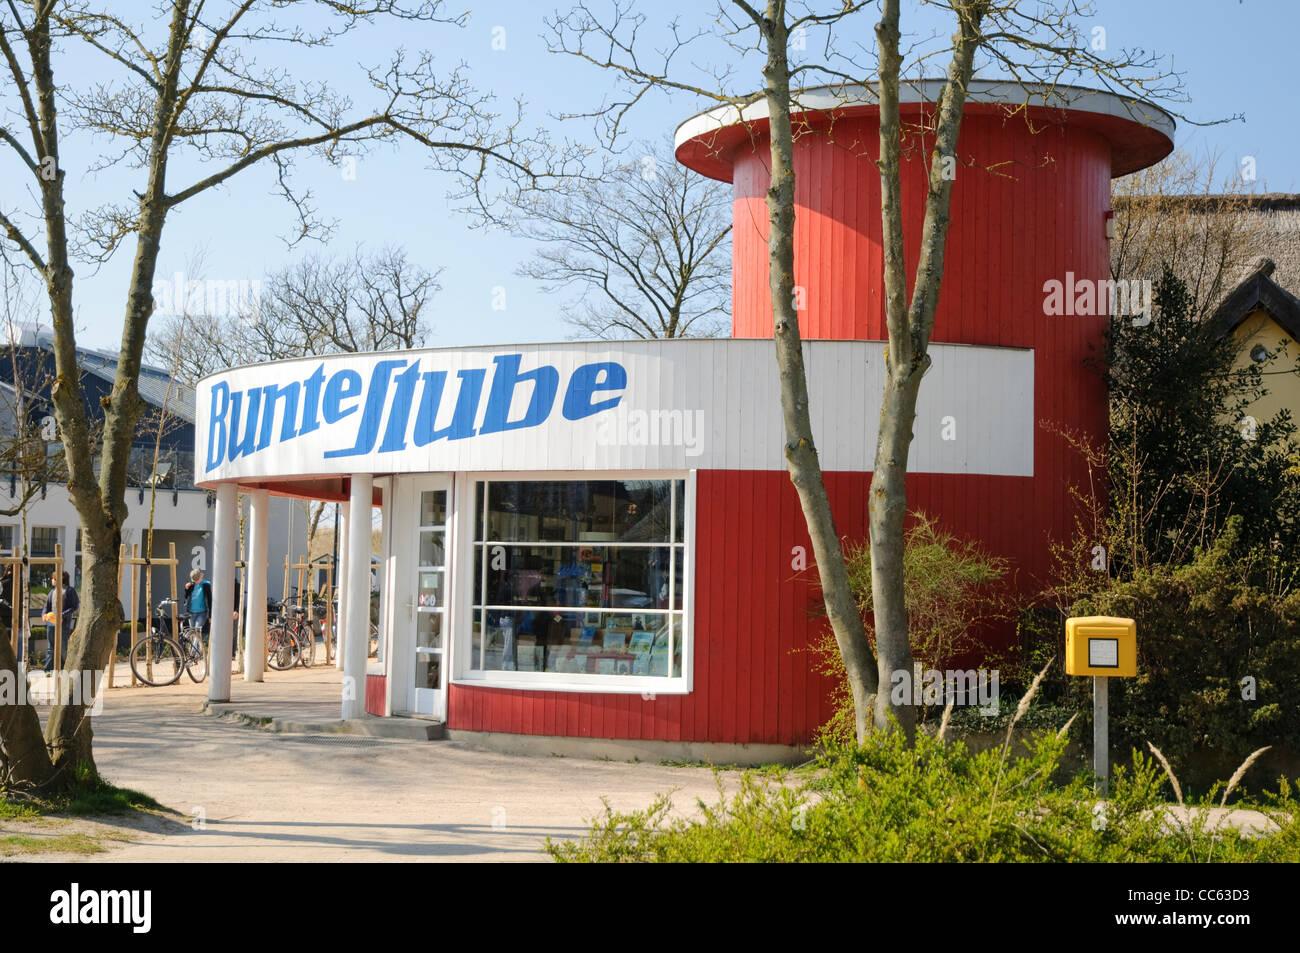 Bunte Stube progettato dal Bauhaus di Rostock architetto Walter Butzek, Bauhaus, nello stile Bauhaus, Ahrenshoop Immagini Stock